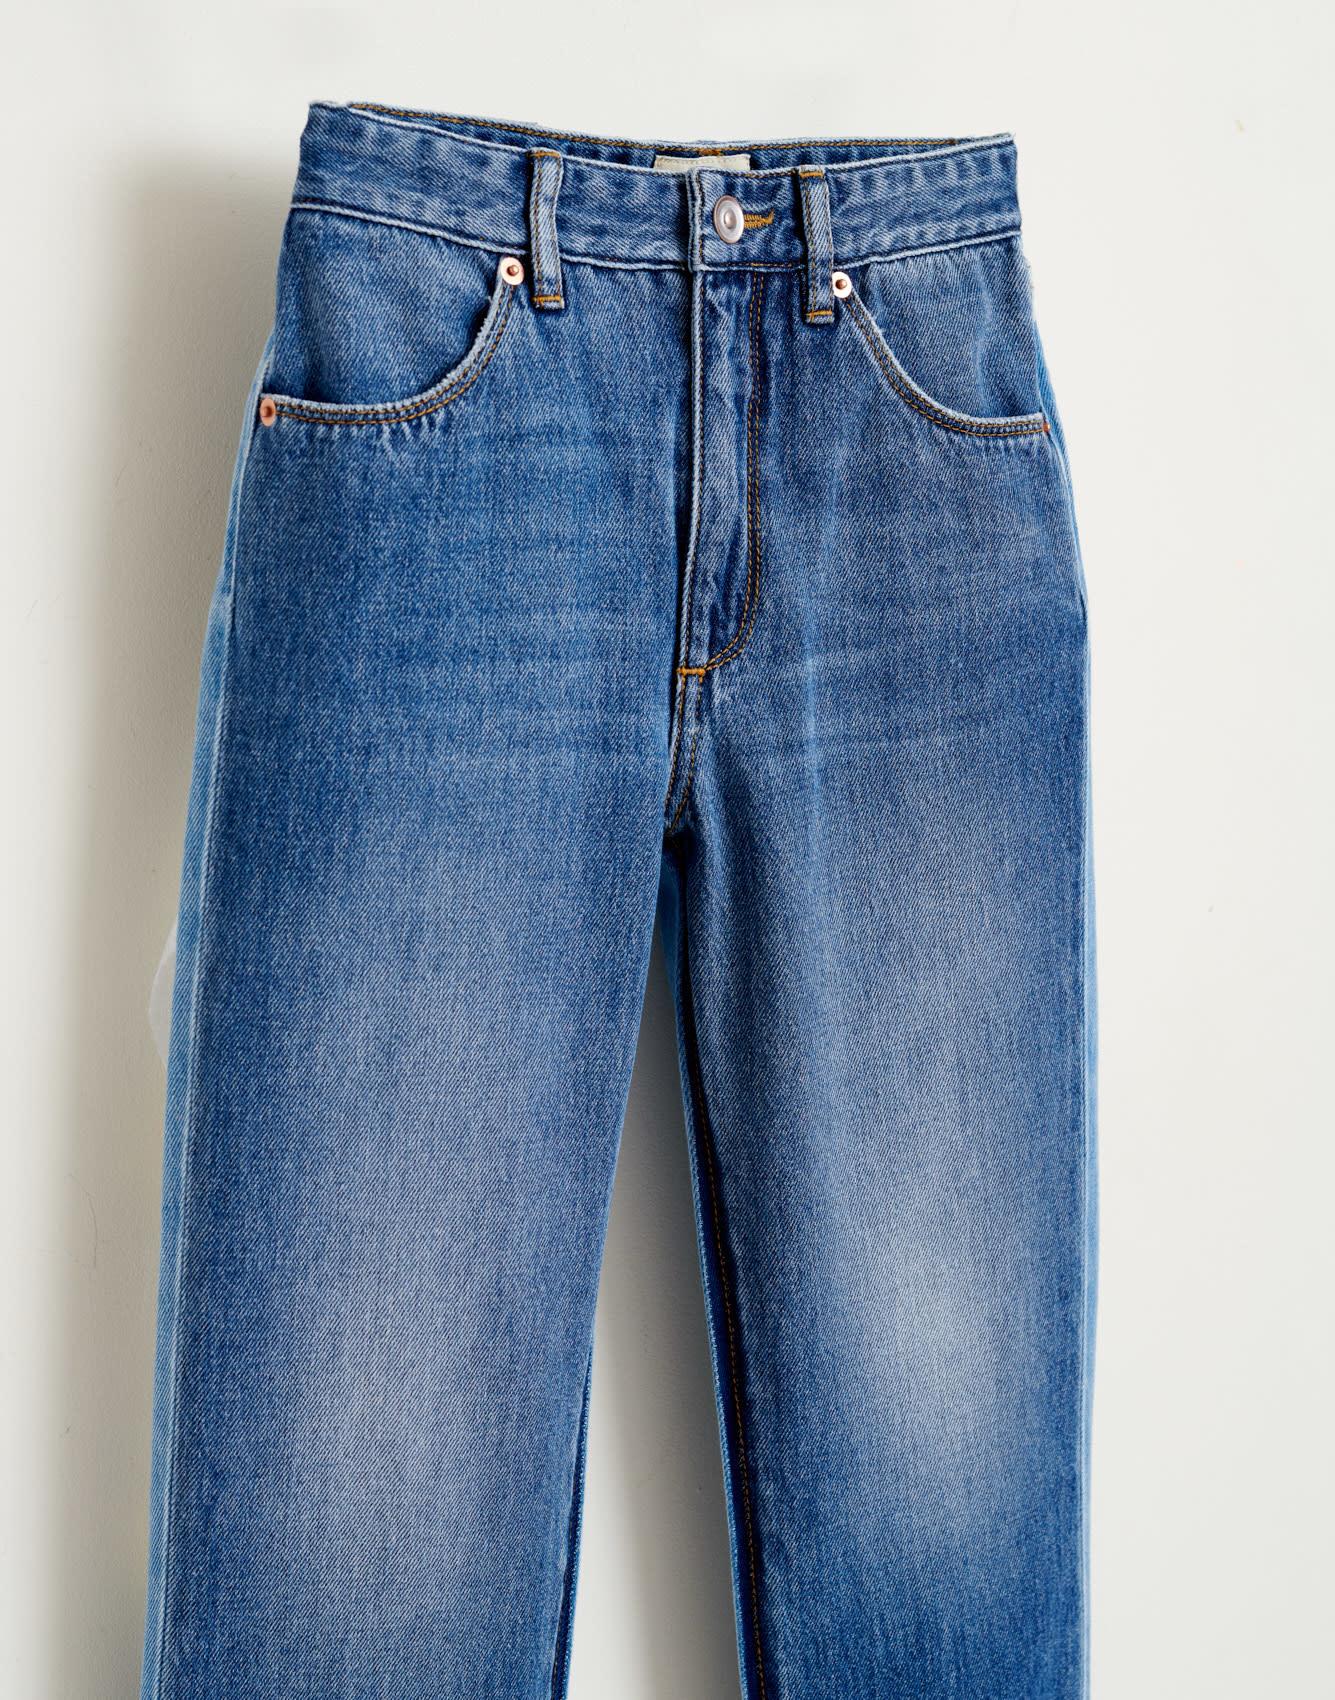 Pinata jeans grand daddy's-3